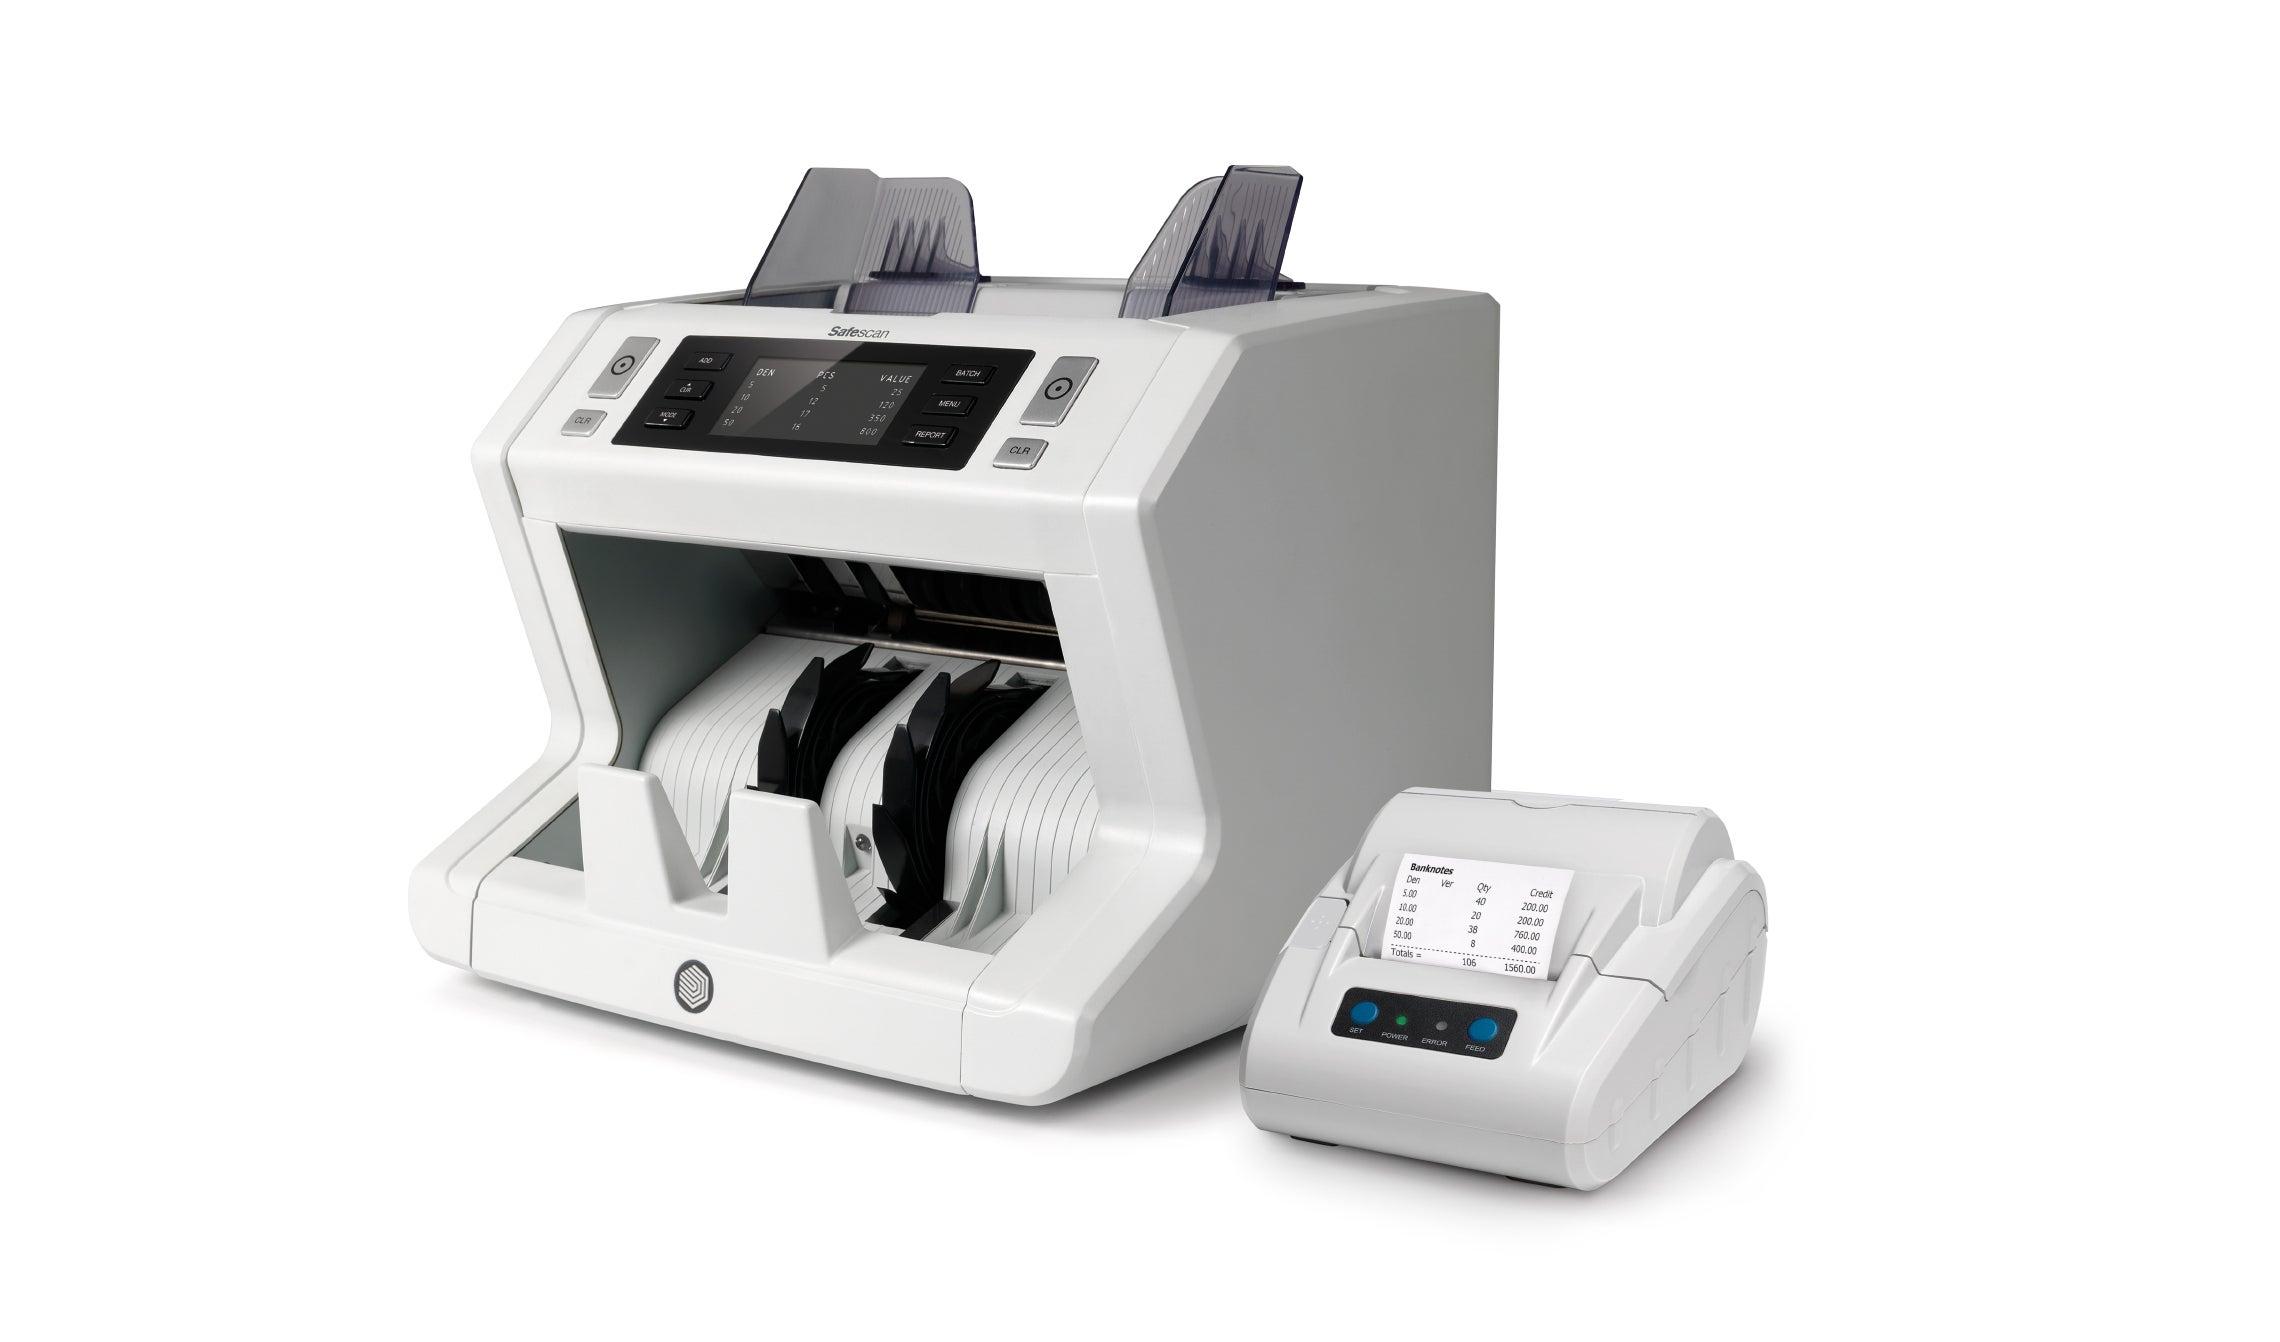 safescan-tp-230-with-safescan-2665